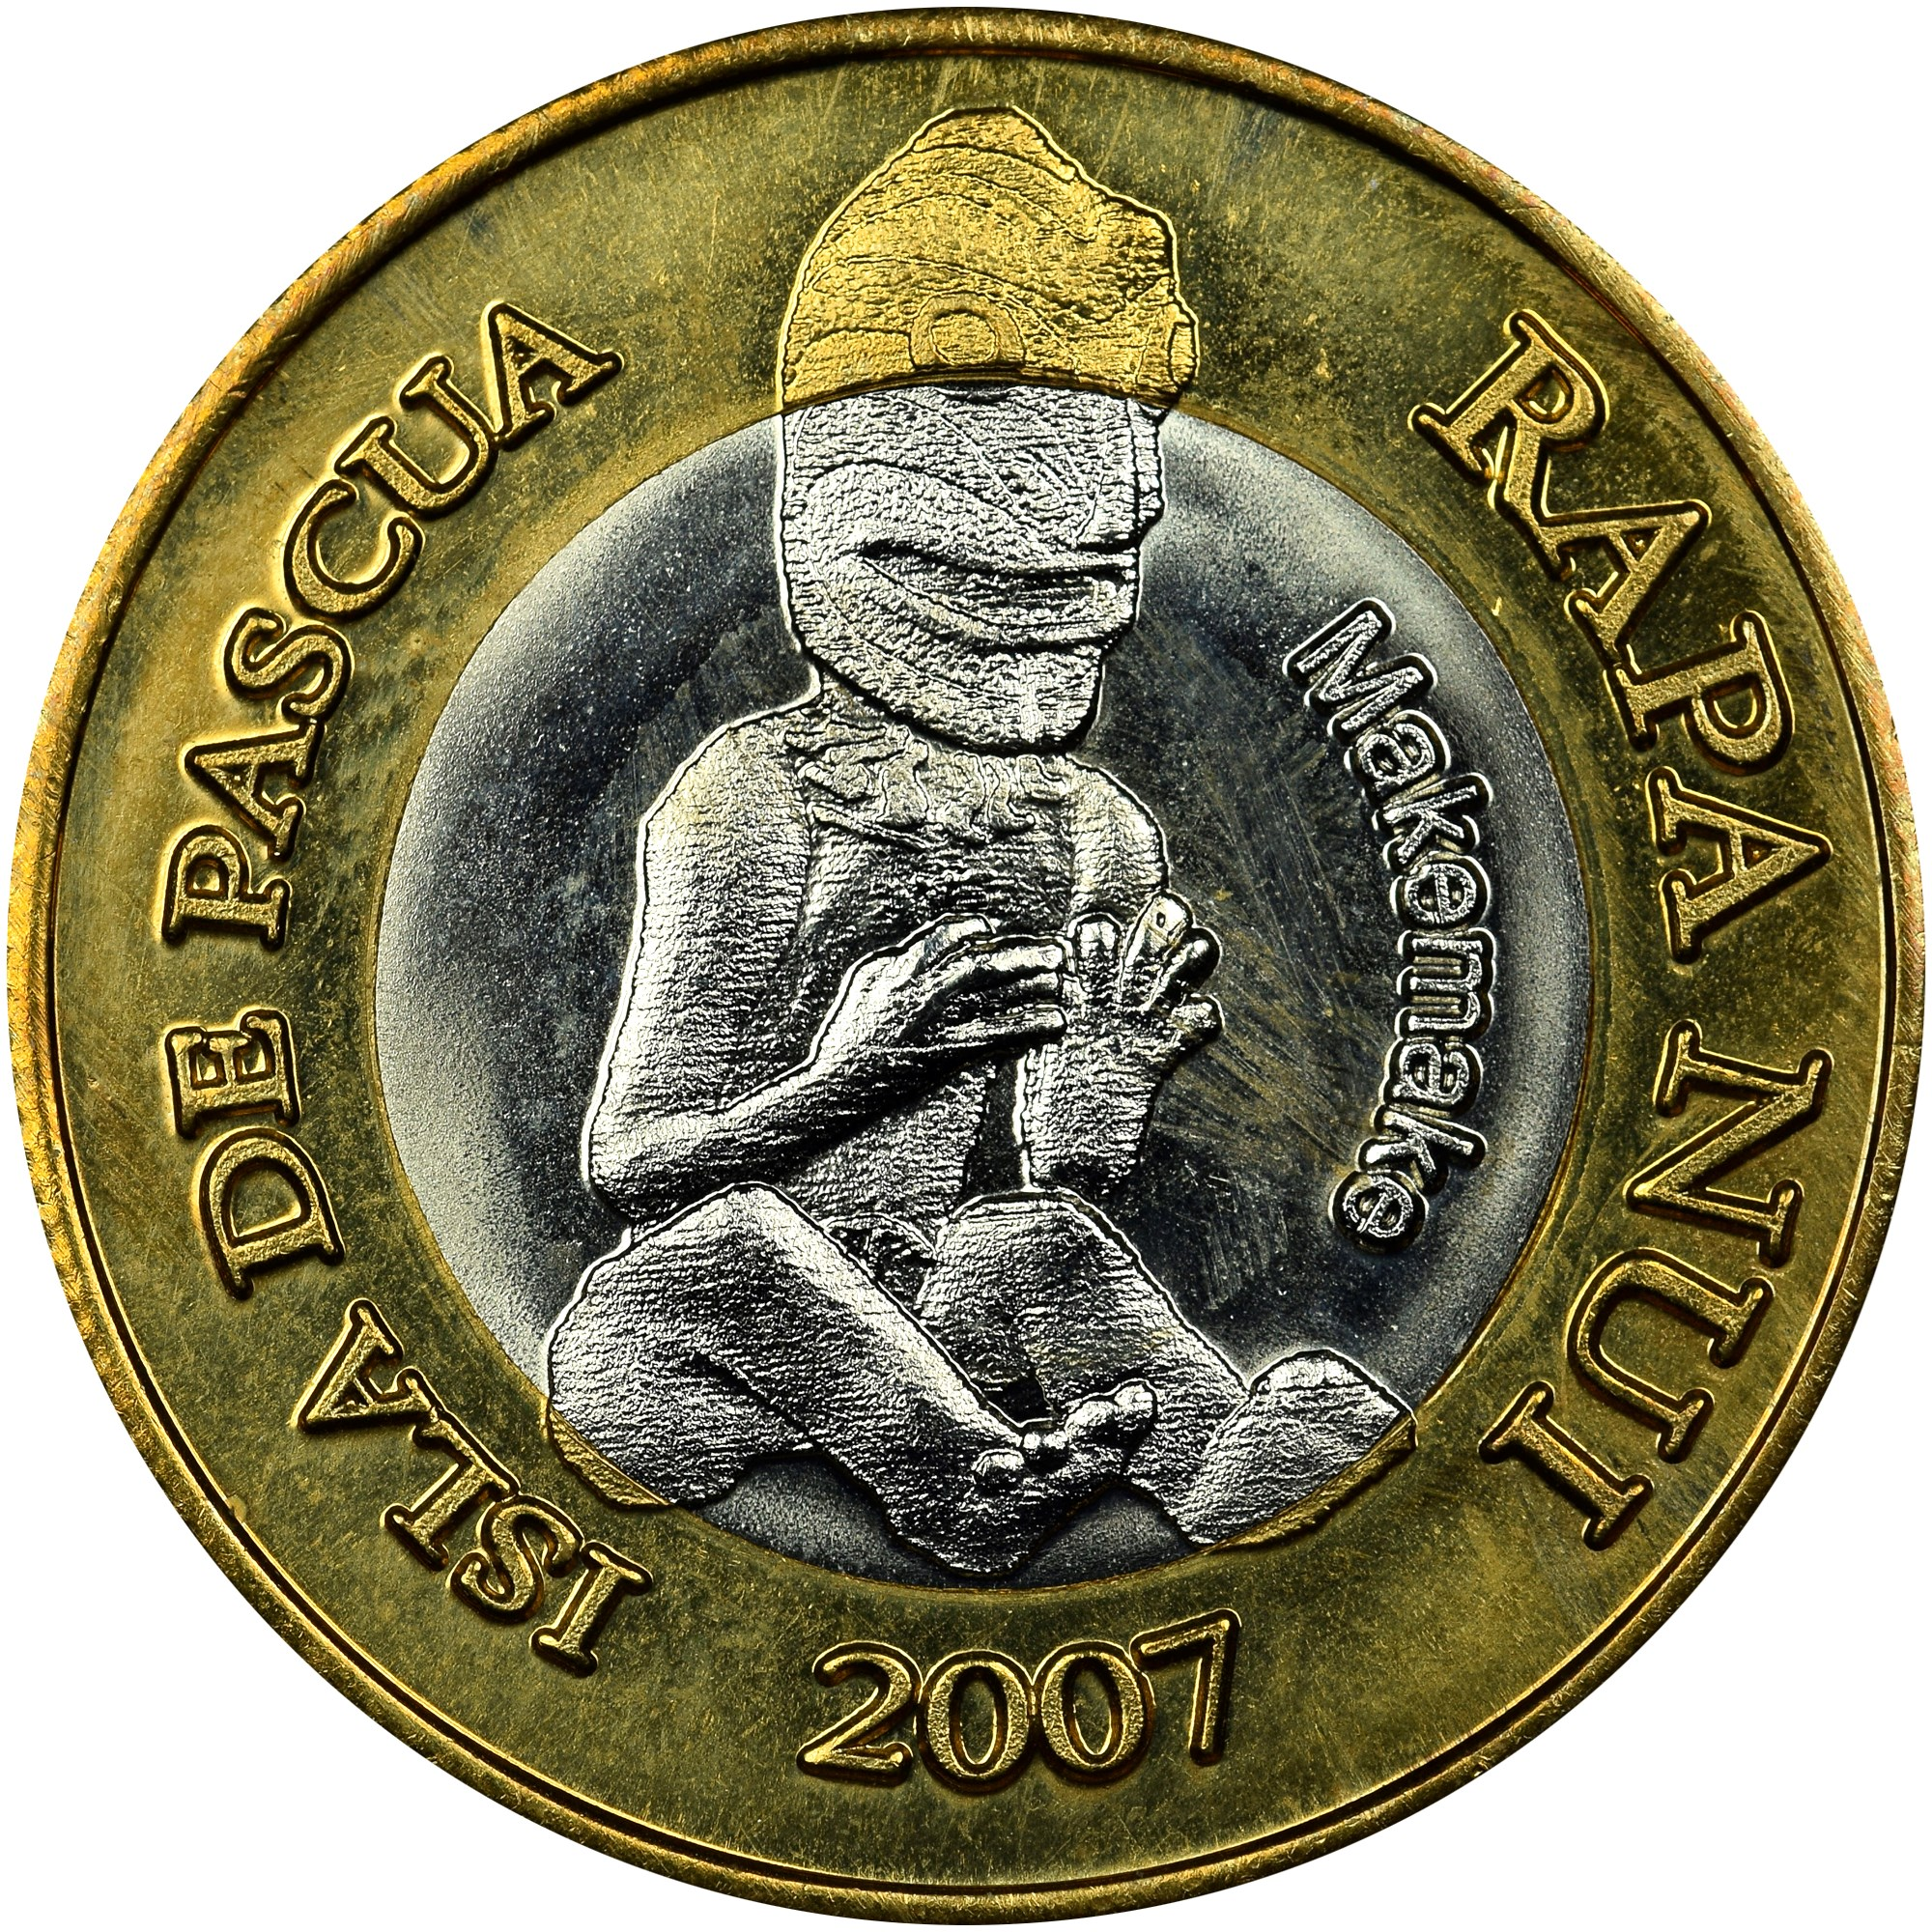 Rapa Nui - Isla De Pascua - Easter Island 200 Pesos obverse